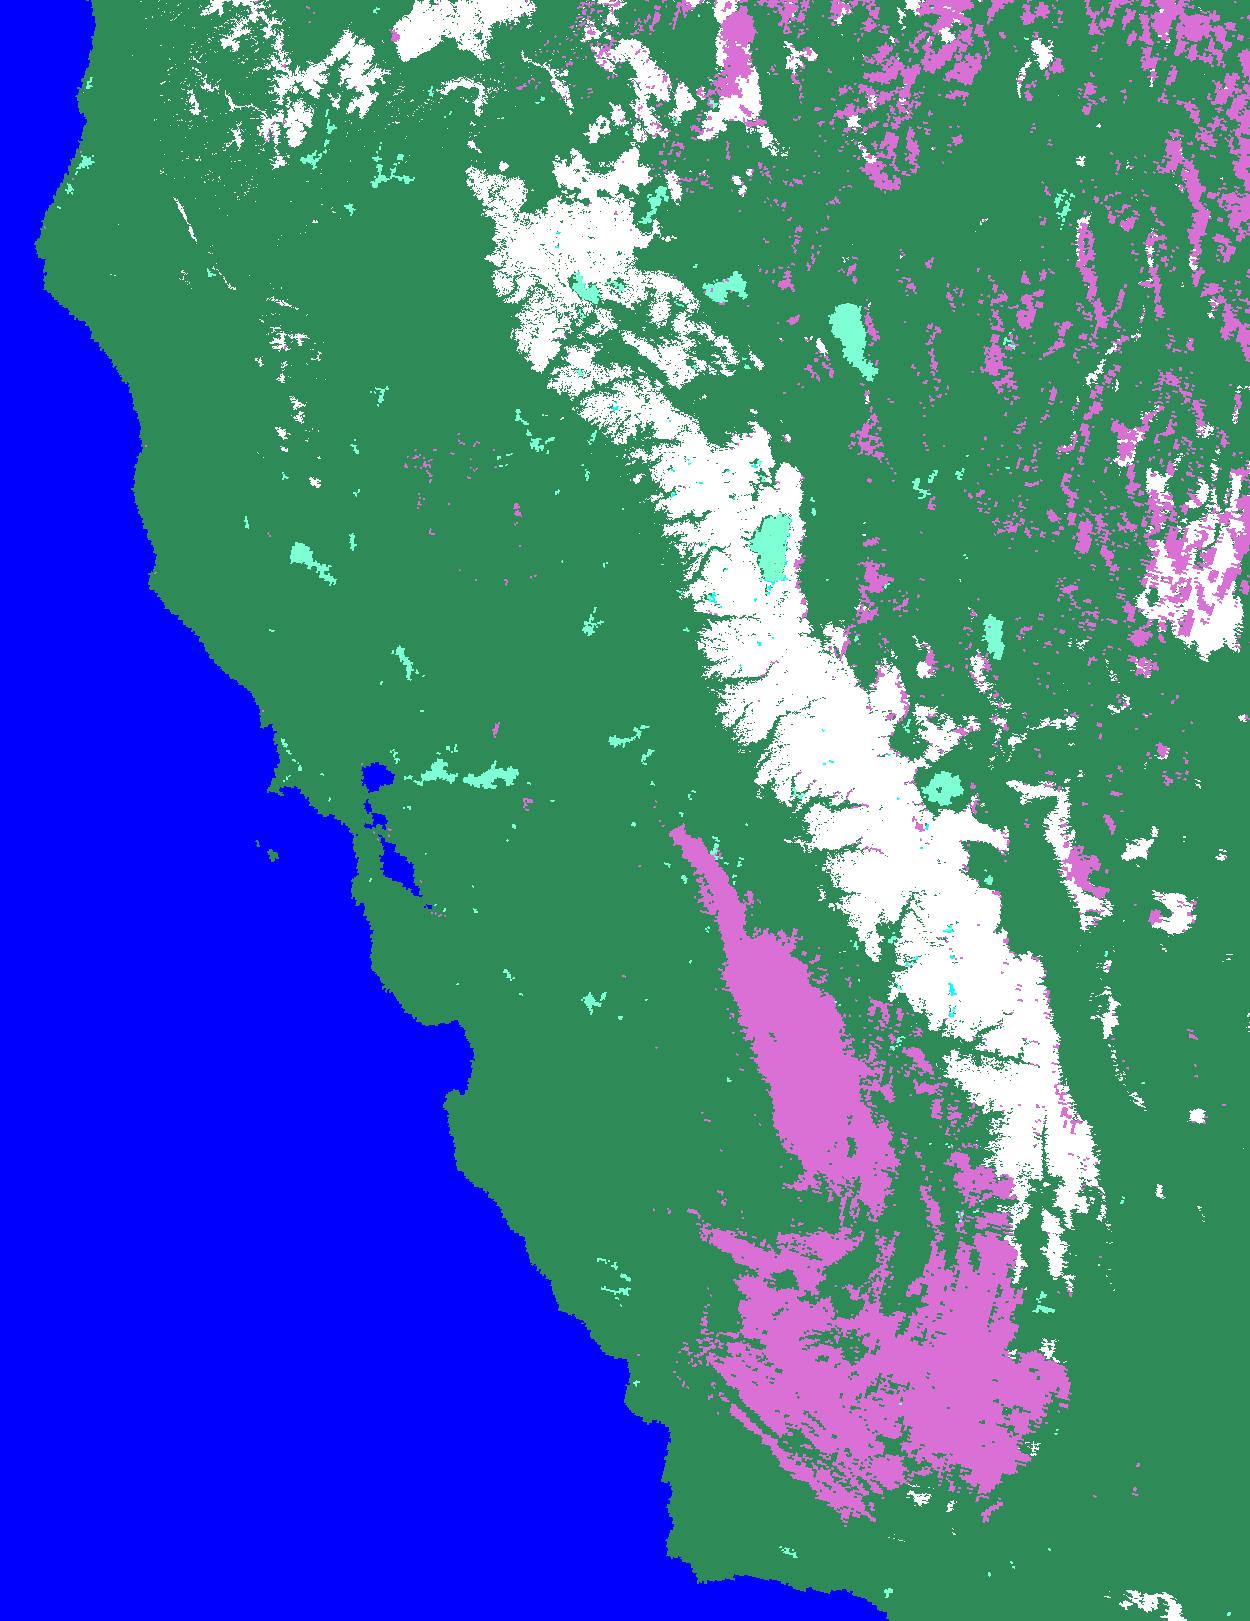 California 10/31/04 - California Snow Map